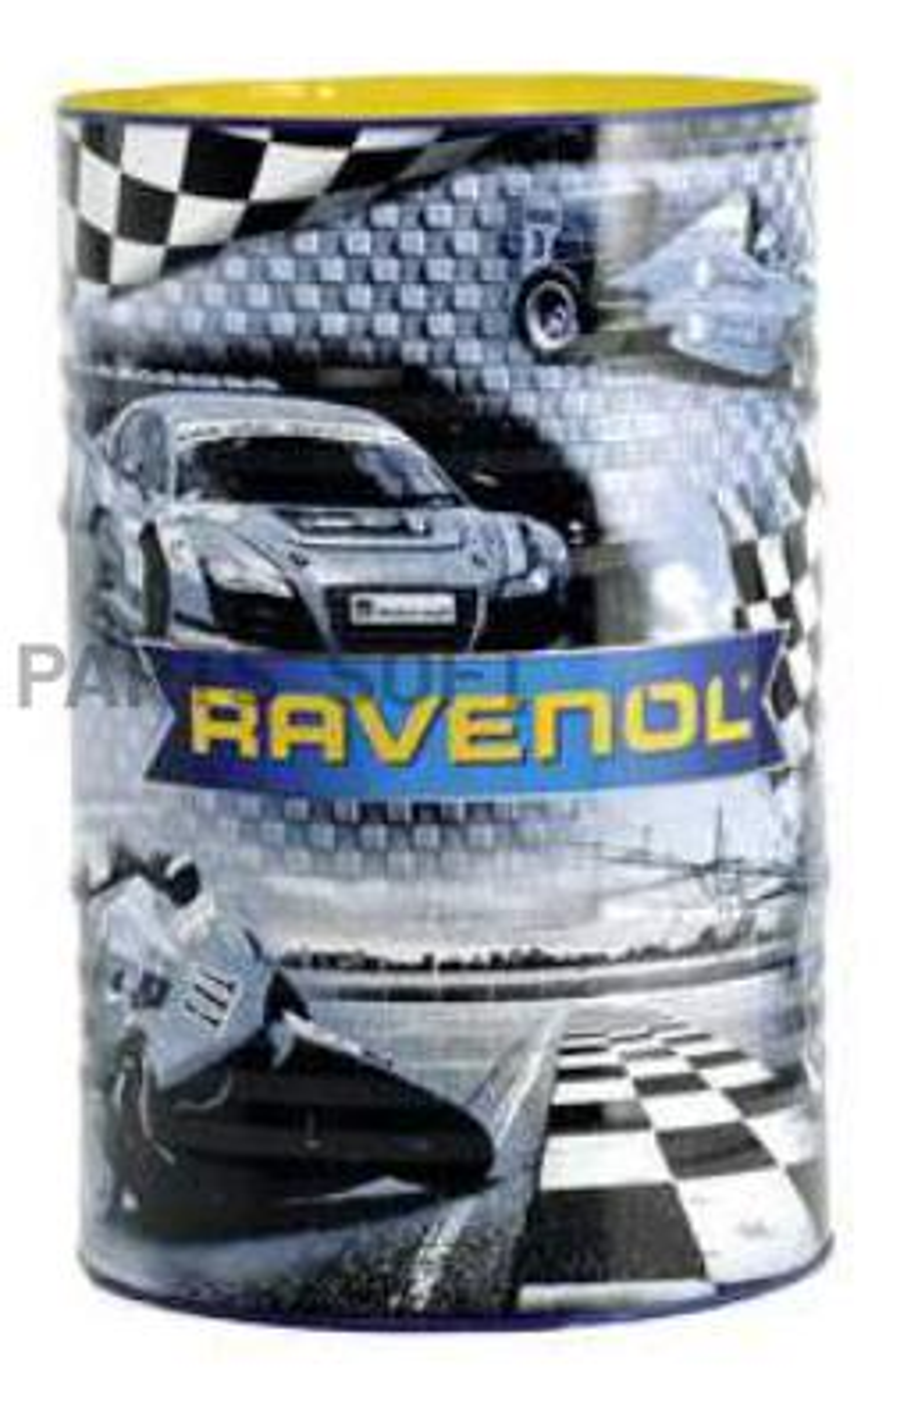 Ravenol Formel Diesel Super SAE 15W-40 .